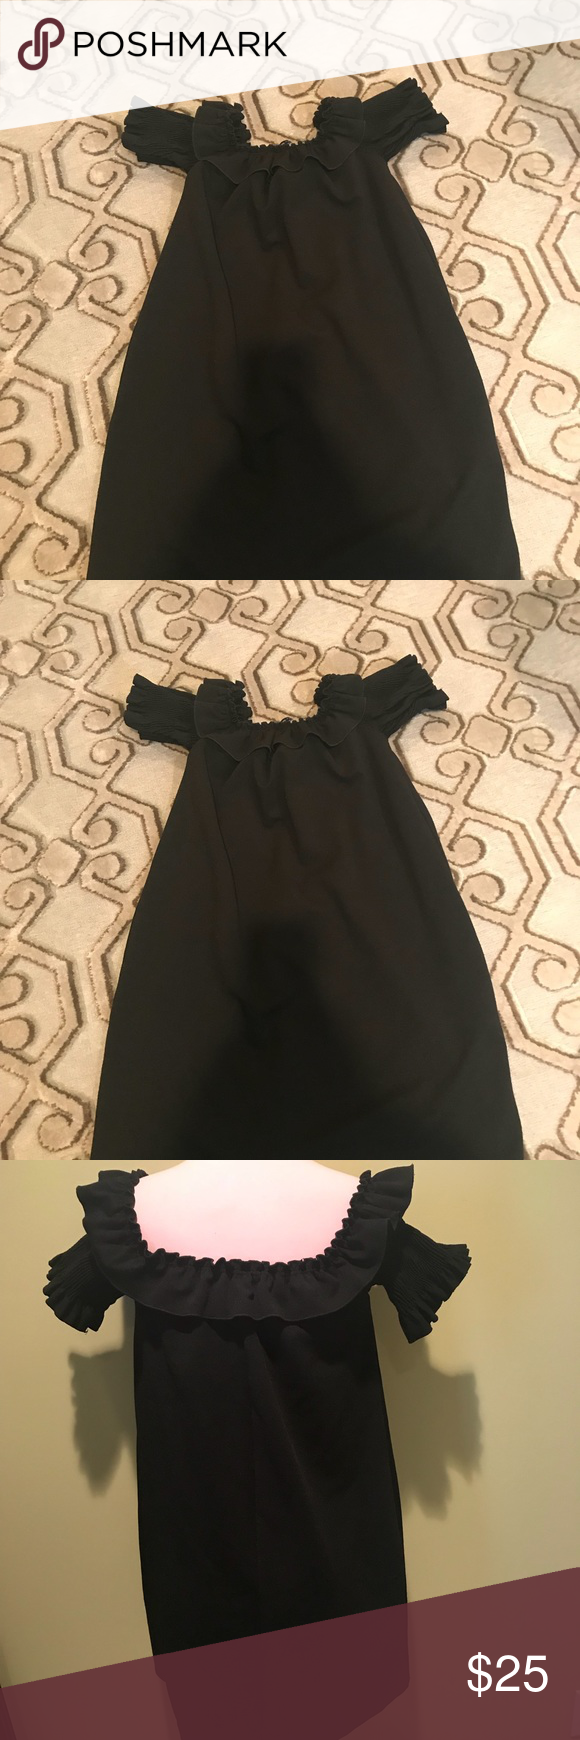 43d2a22030c9 Cute little loose fit dress from Zara Dress is off shoulder that s why  looks bit weird